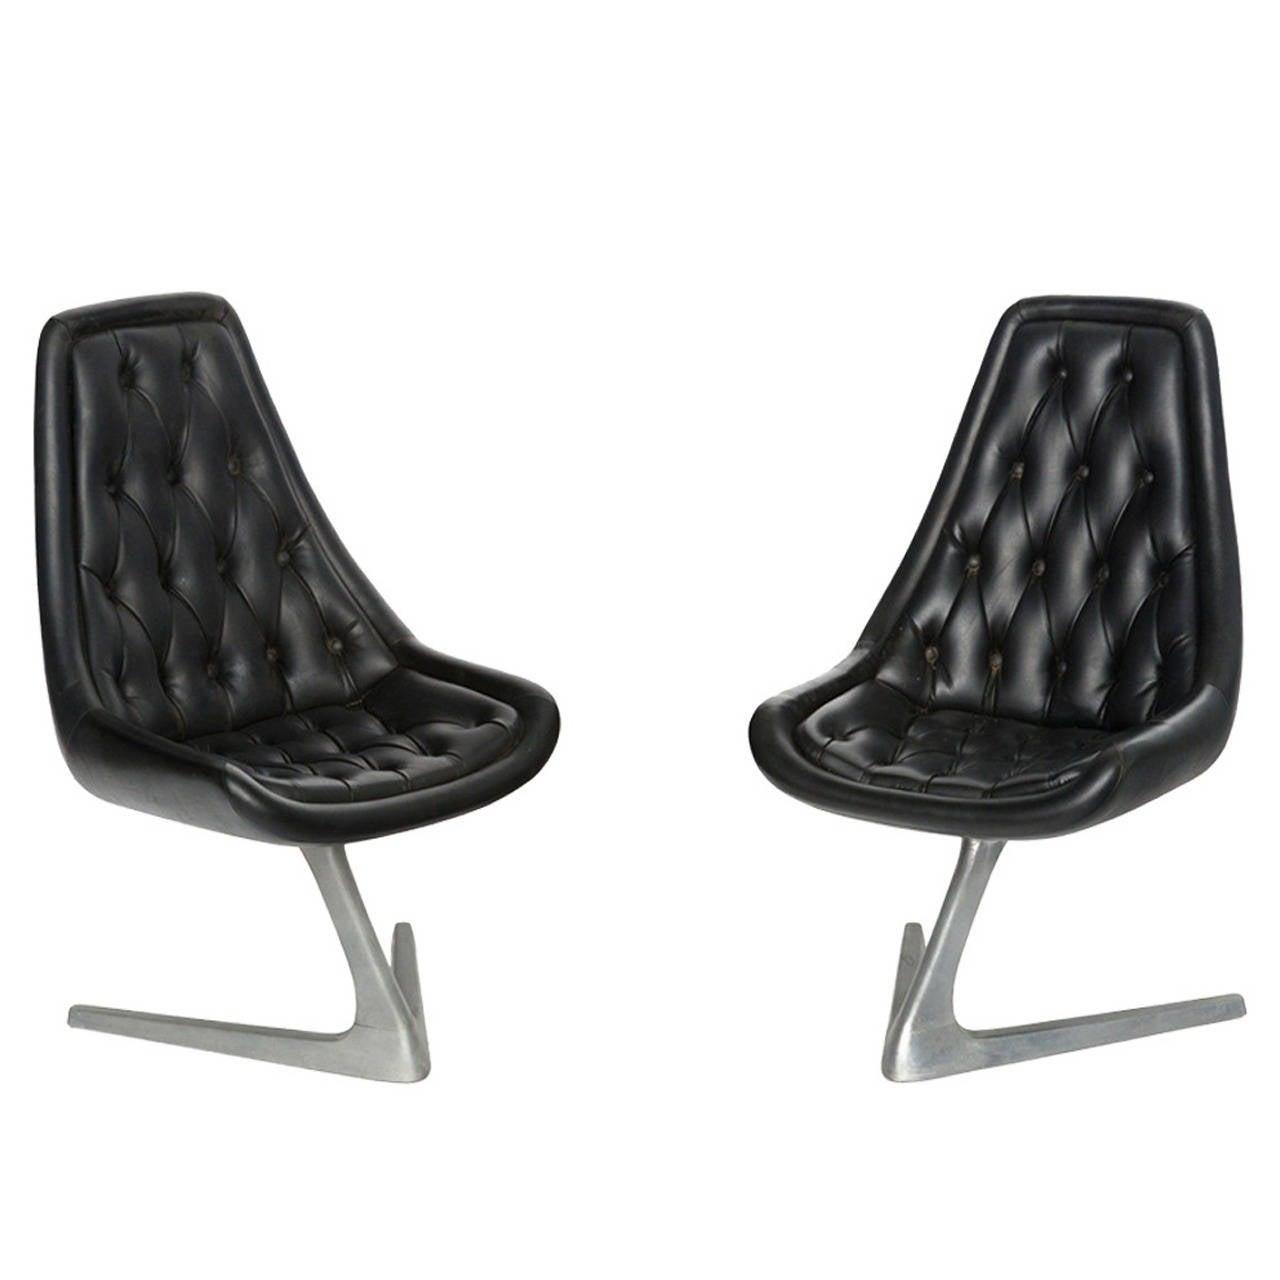 Chromcraft Sculpta Star Trek Chairs 2 Available At 1stdibs